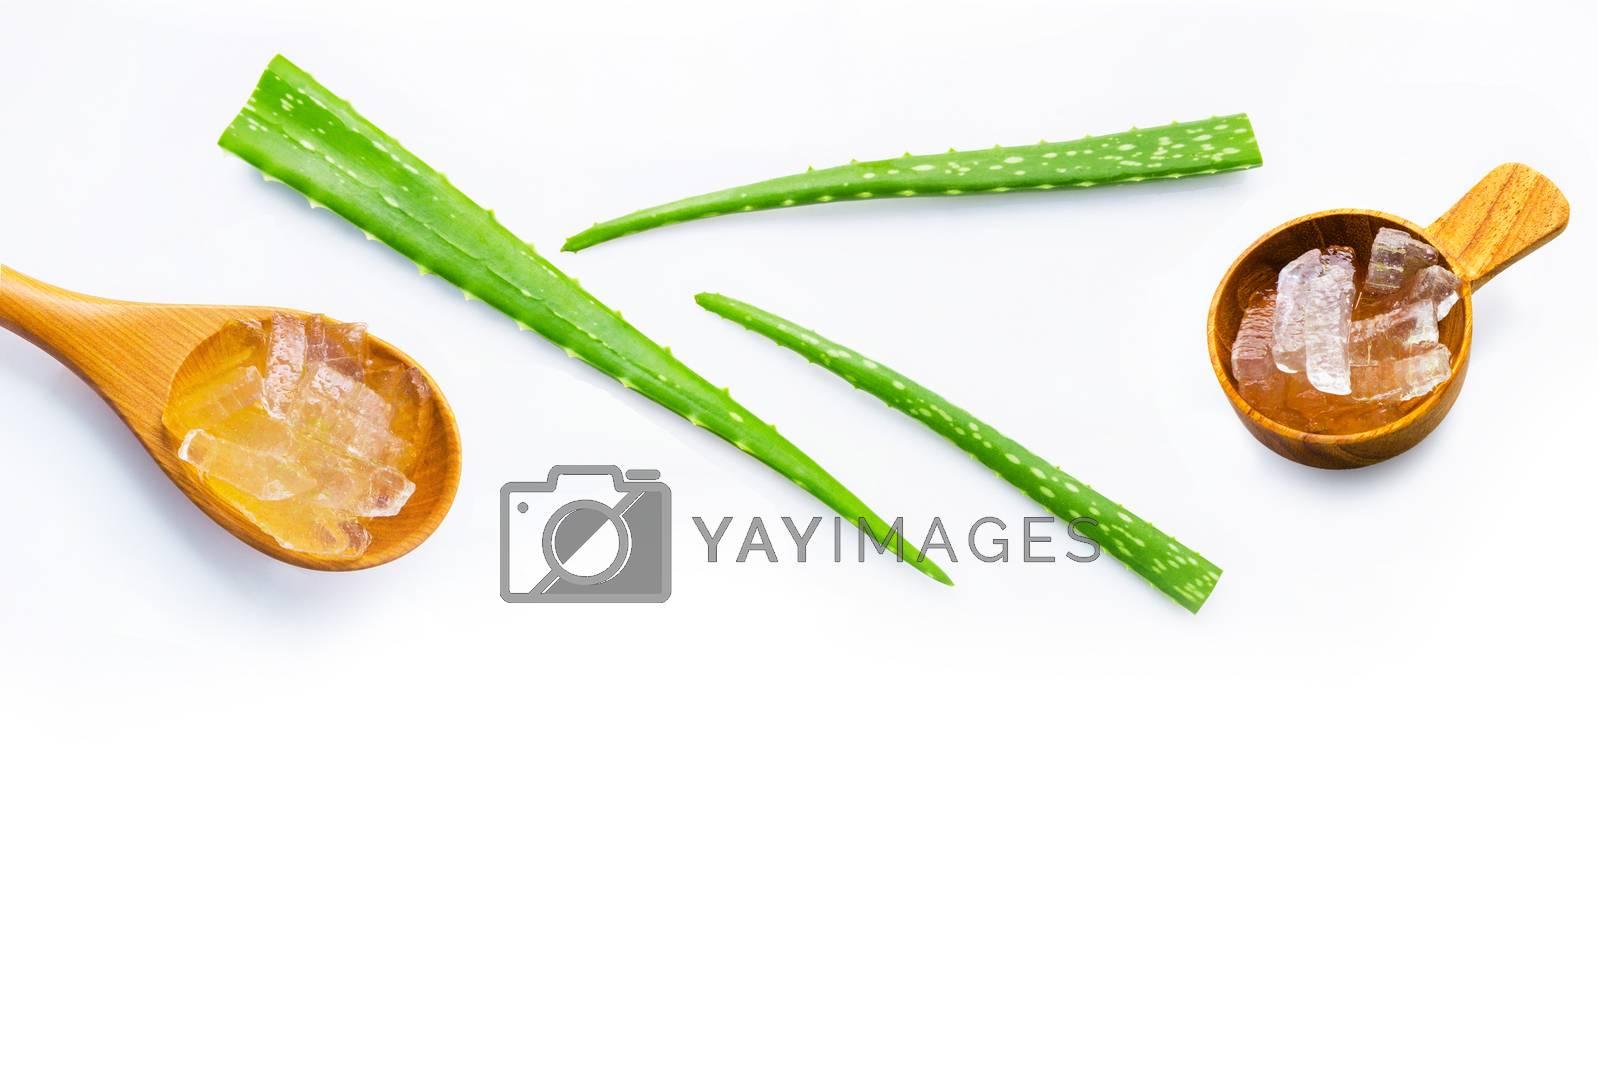 Aloe vera fresh leaves with aloe vera gel on wooden spoon.  by Bowonpat